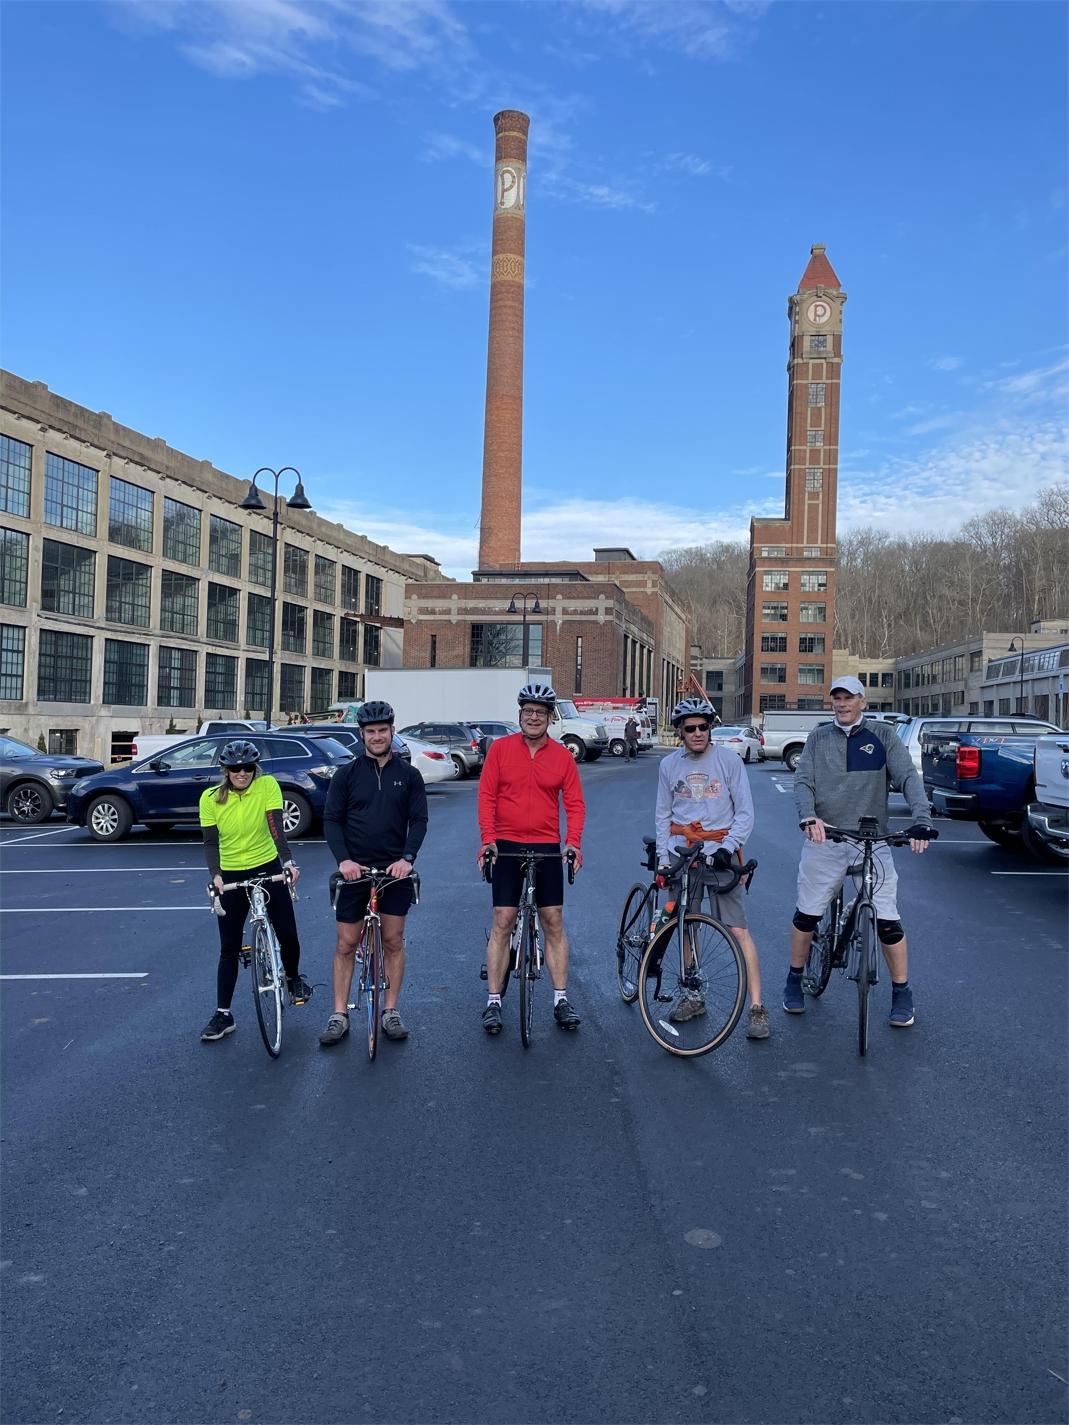 Riding together as a team for Ride Cincinnati 2020